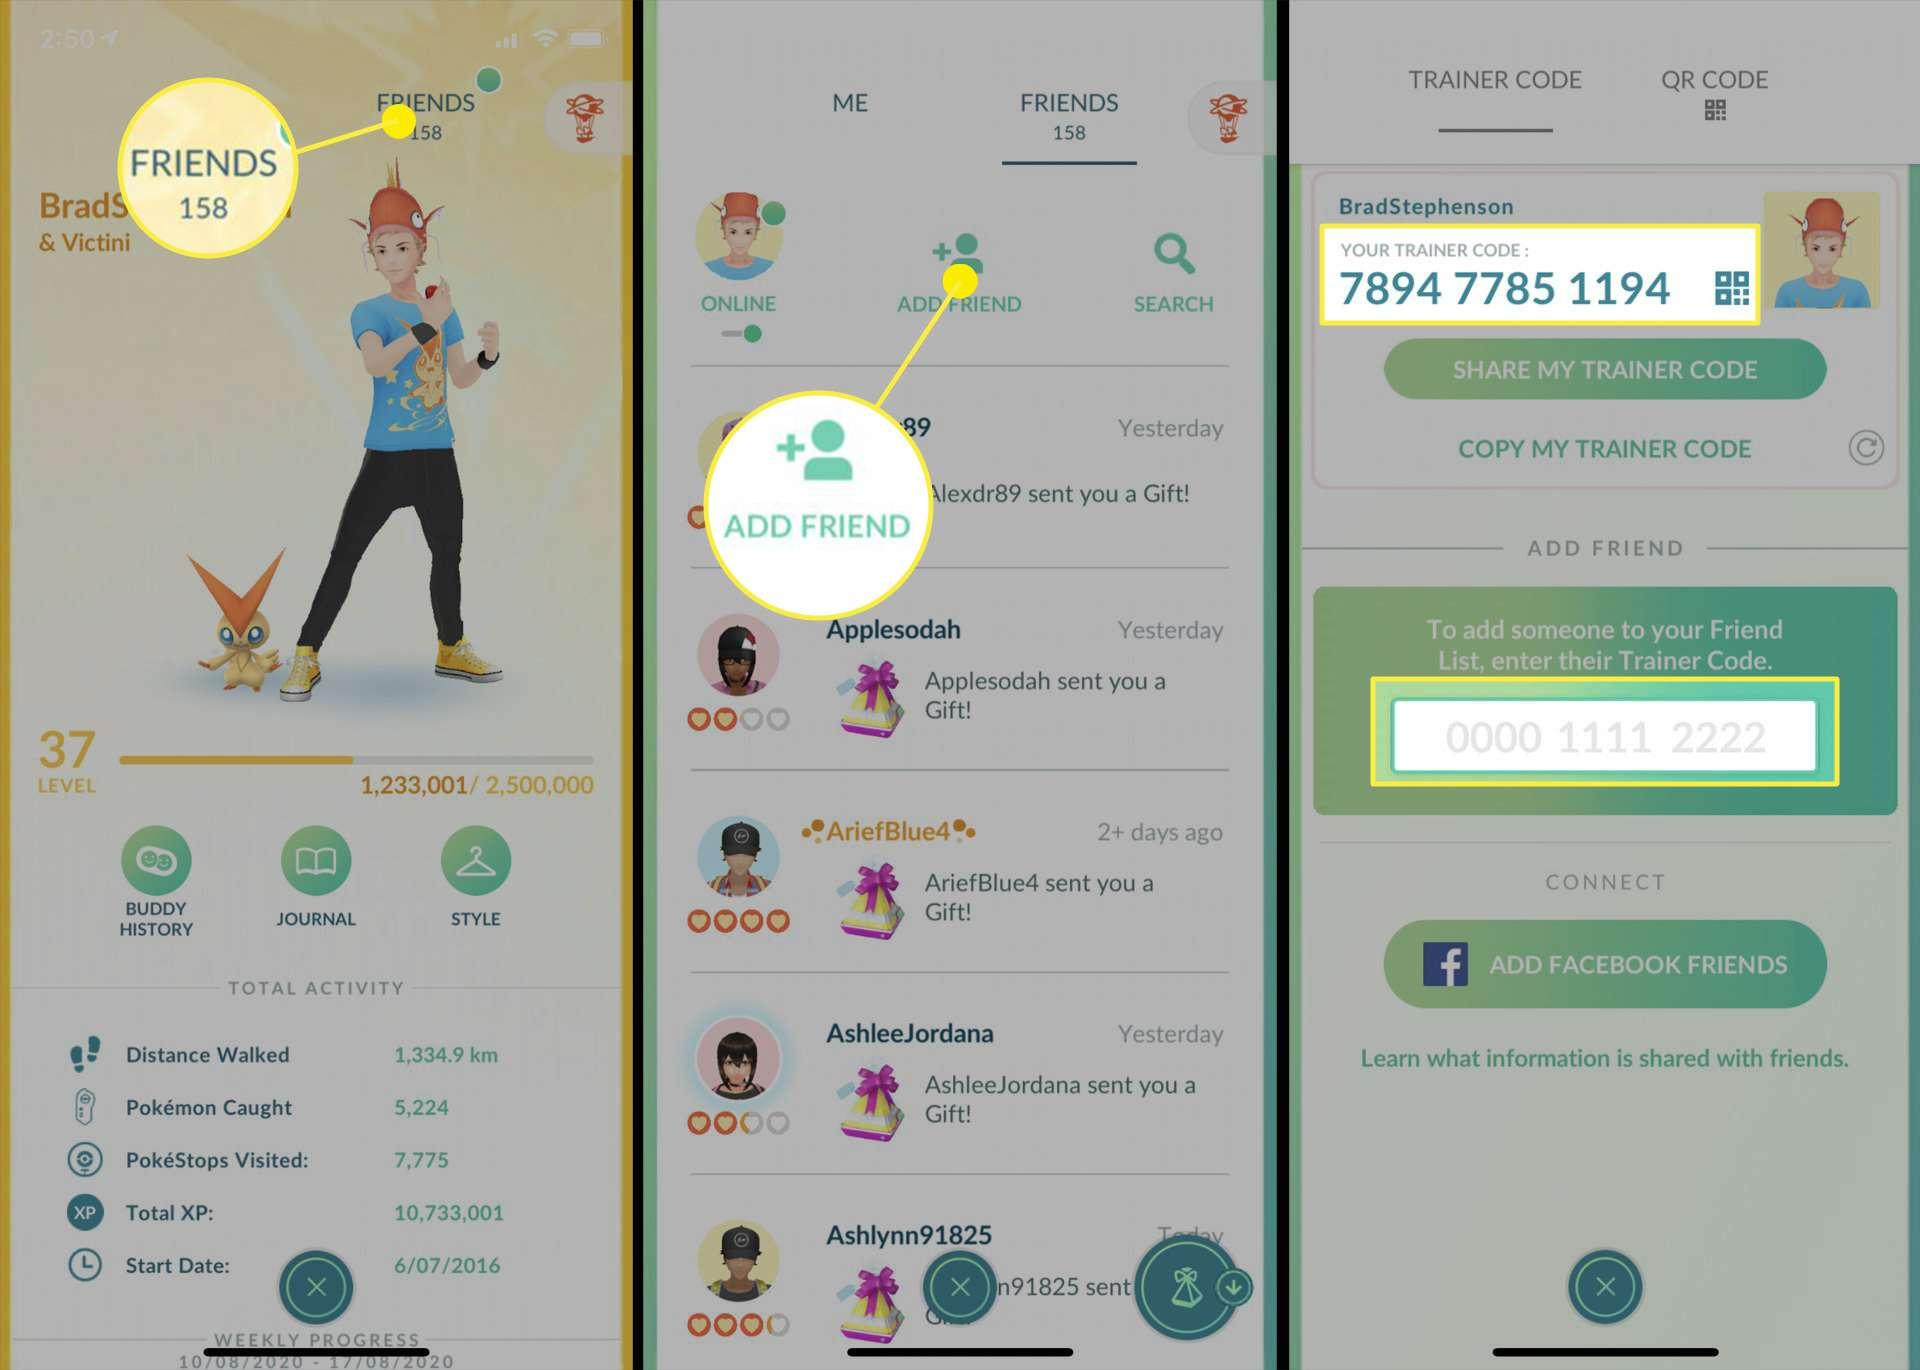 Pokemon GO profile and friend settings.